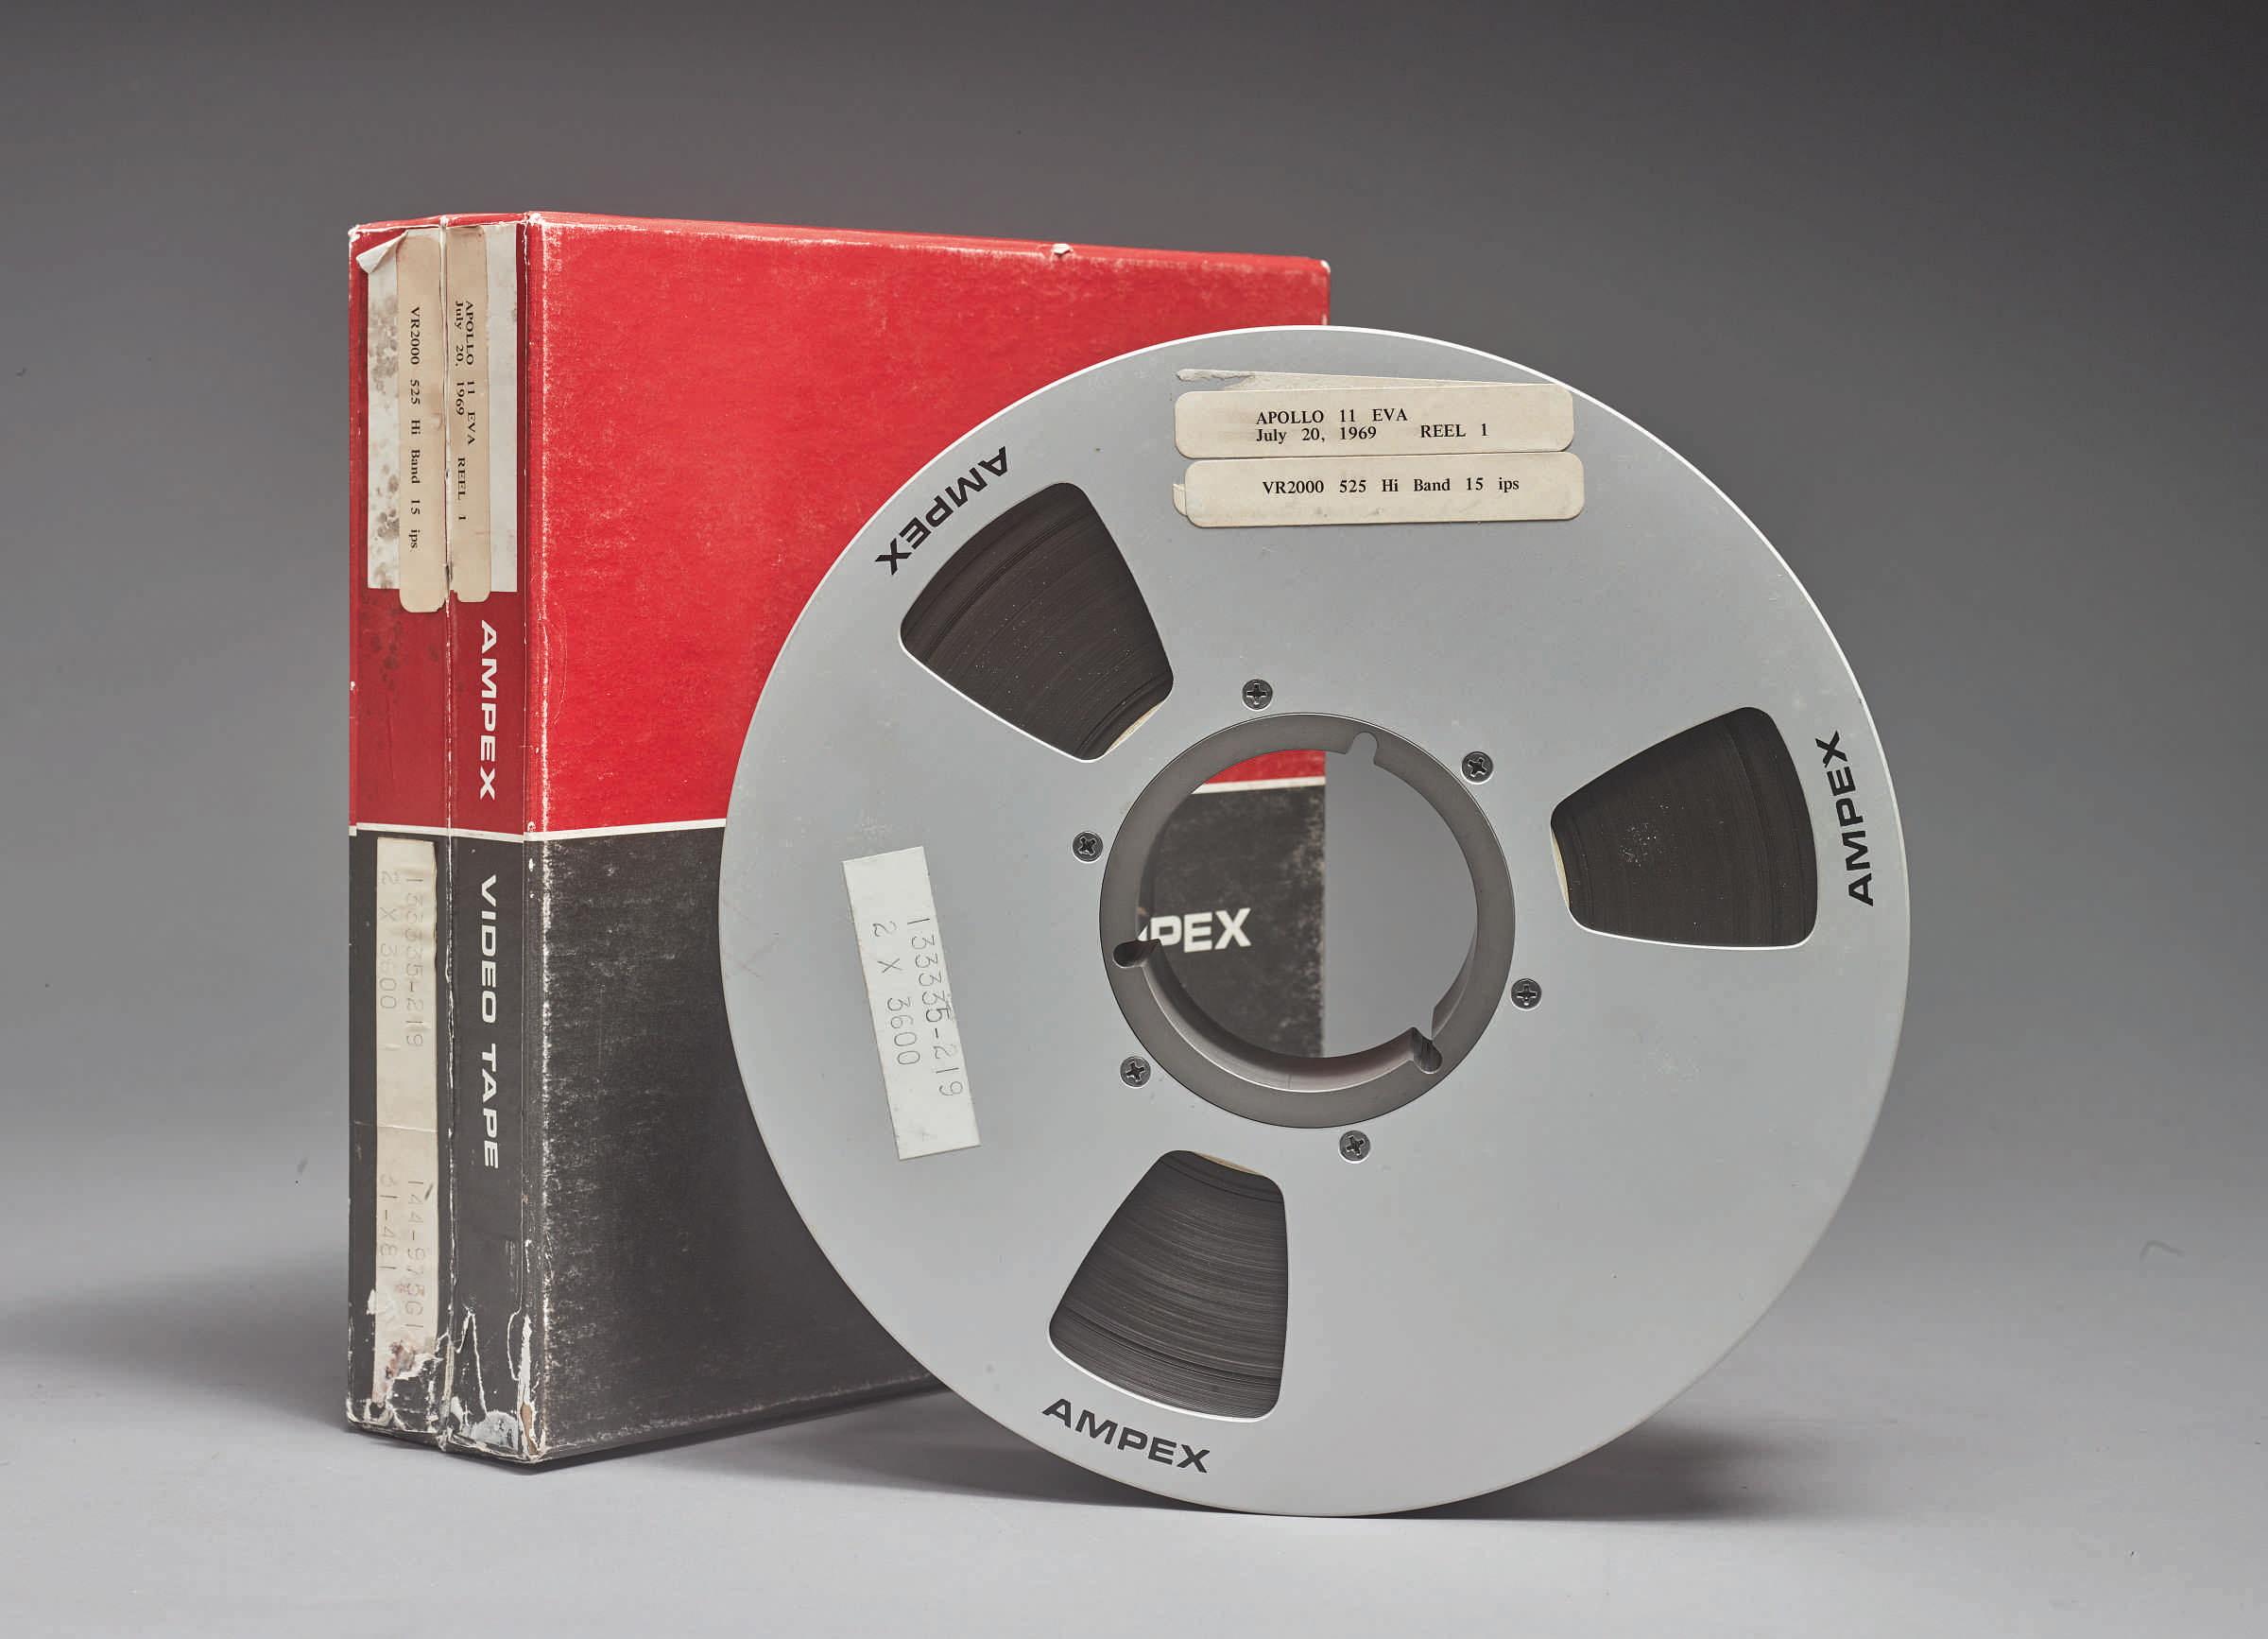 Apollo 11 Tapes Reel 1 - Original Apollo 11 landing videotapes sell for $1.8M